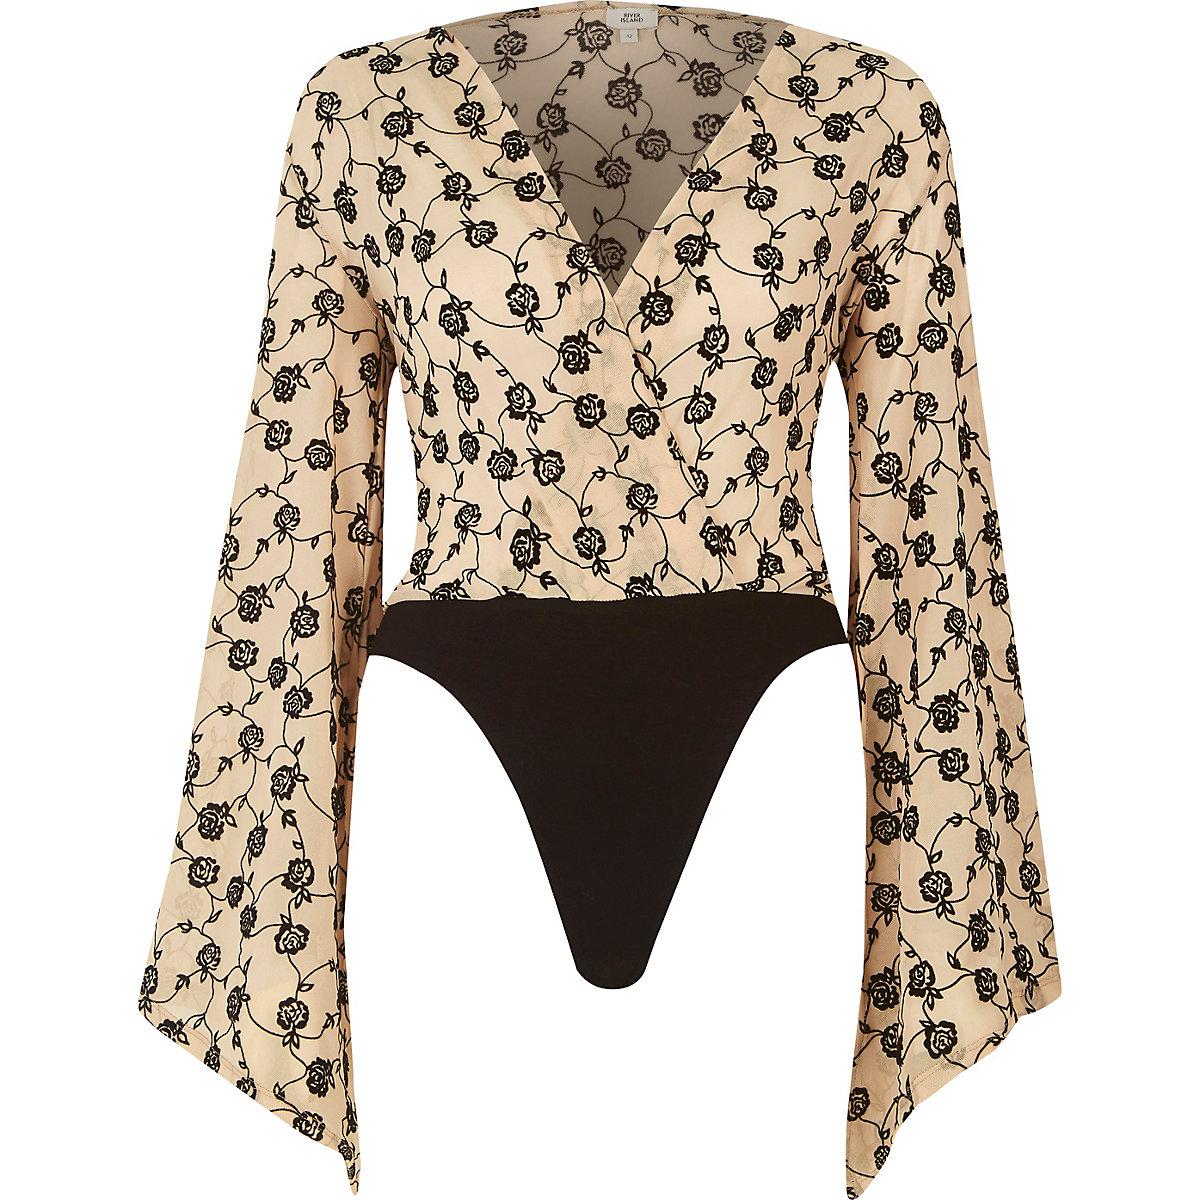 ad54bec9d1 Cream floral plunge flute sleeve bodysuit - RI Limited Edition - women